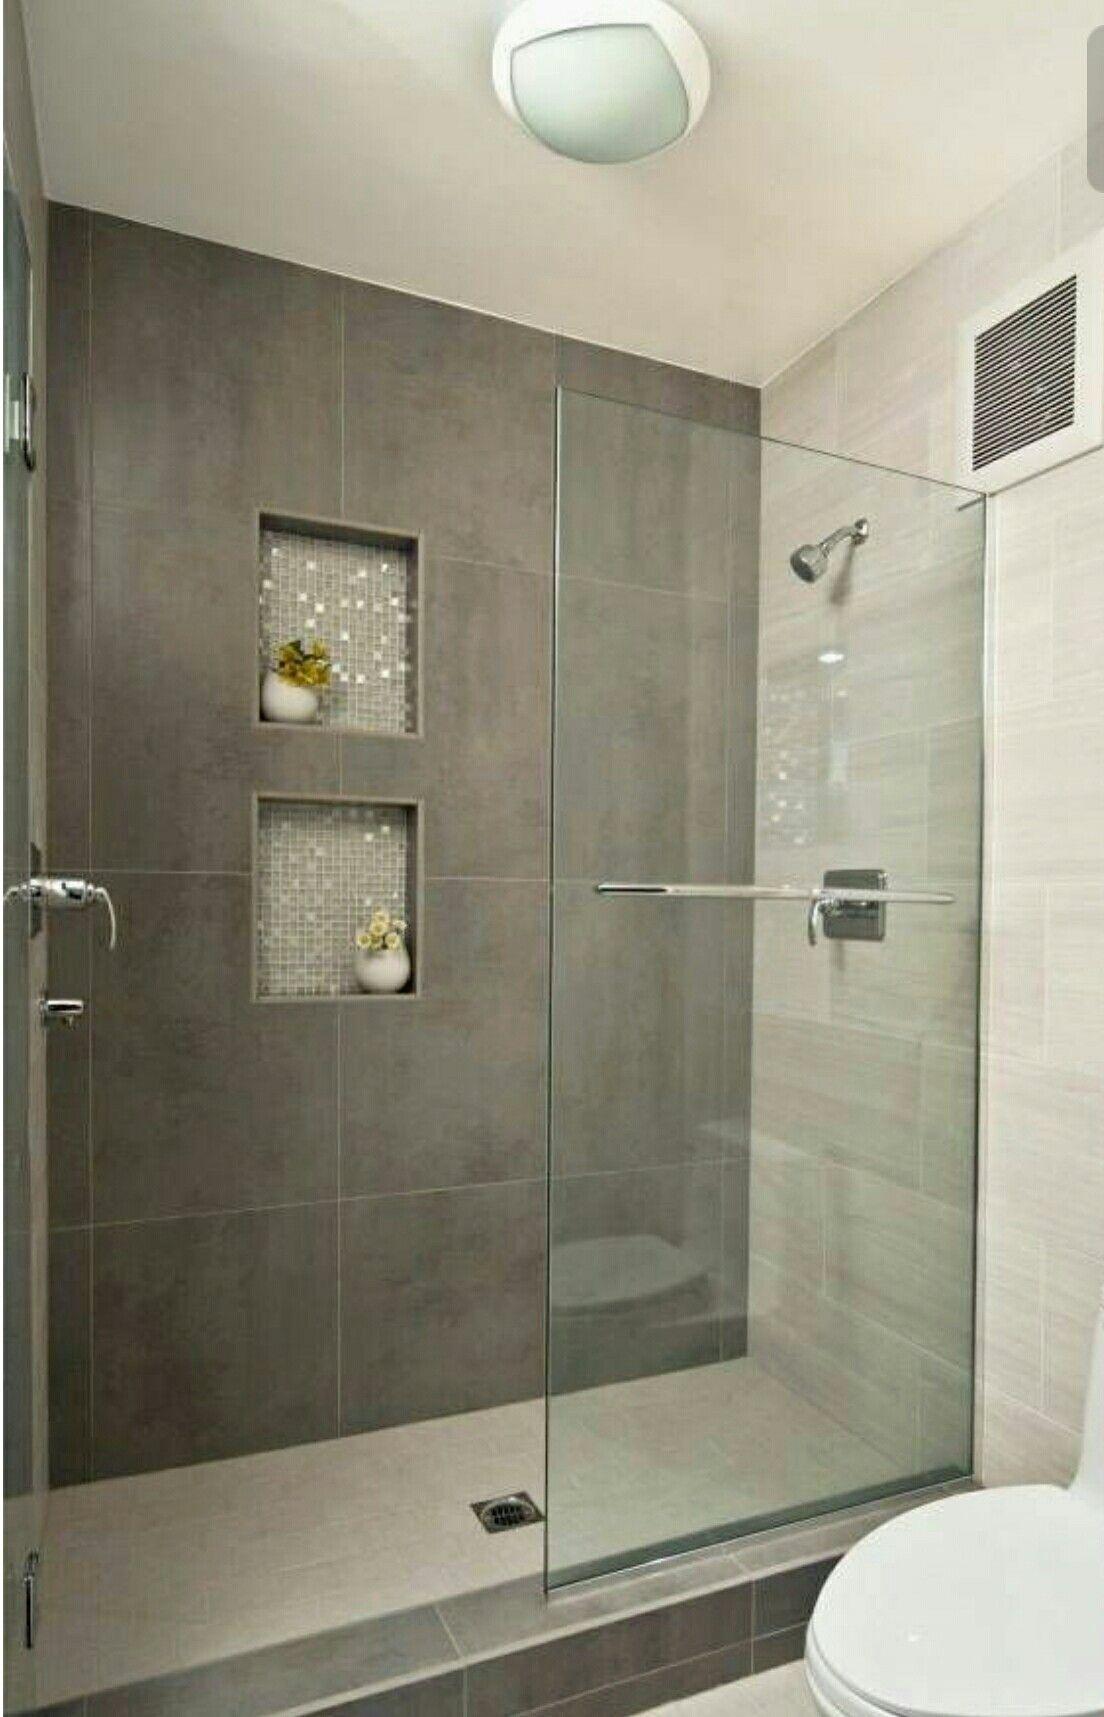 Double shower | Small bathroom with shower, Bathroom, Tiny ... on mobile home designs small bathrooms, fancy modern interior design bathrooms, decor ideas for small bathrooms, paint colors ideas for small bathrooms, spa ideas for small bathrooms, rv shower and toilet combo bathrooms, doorless shower designs for small bathrooms, corner shower units for small bathrooms, shower style for small bathrooms, makeover ideas for small bathrooms, shower with tub idea, white bathroom ideas for small bathrooms, walk in shower designs for small bathrooms, apartment small space bathrooms, shower stalls for small bathroom tile, decorating bathrooms ideas small bathrooms, shower tile design, signs for no public bathrooms,